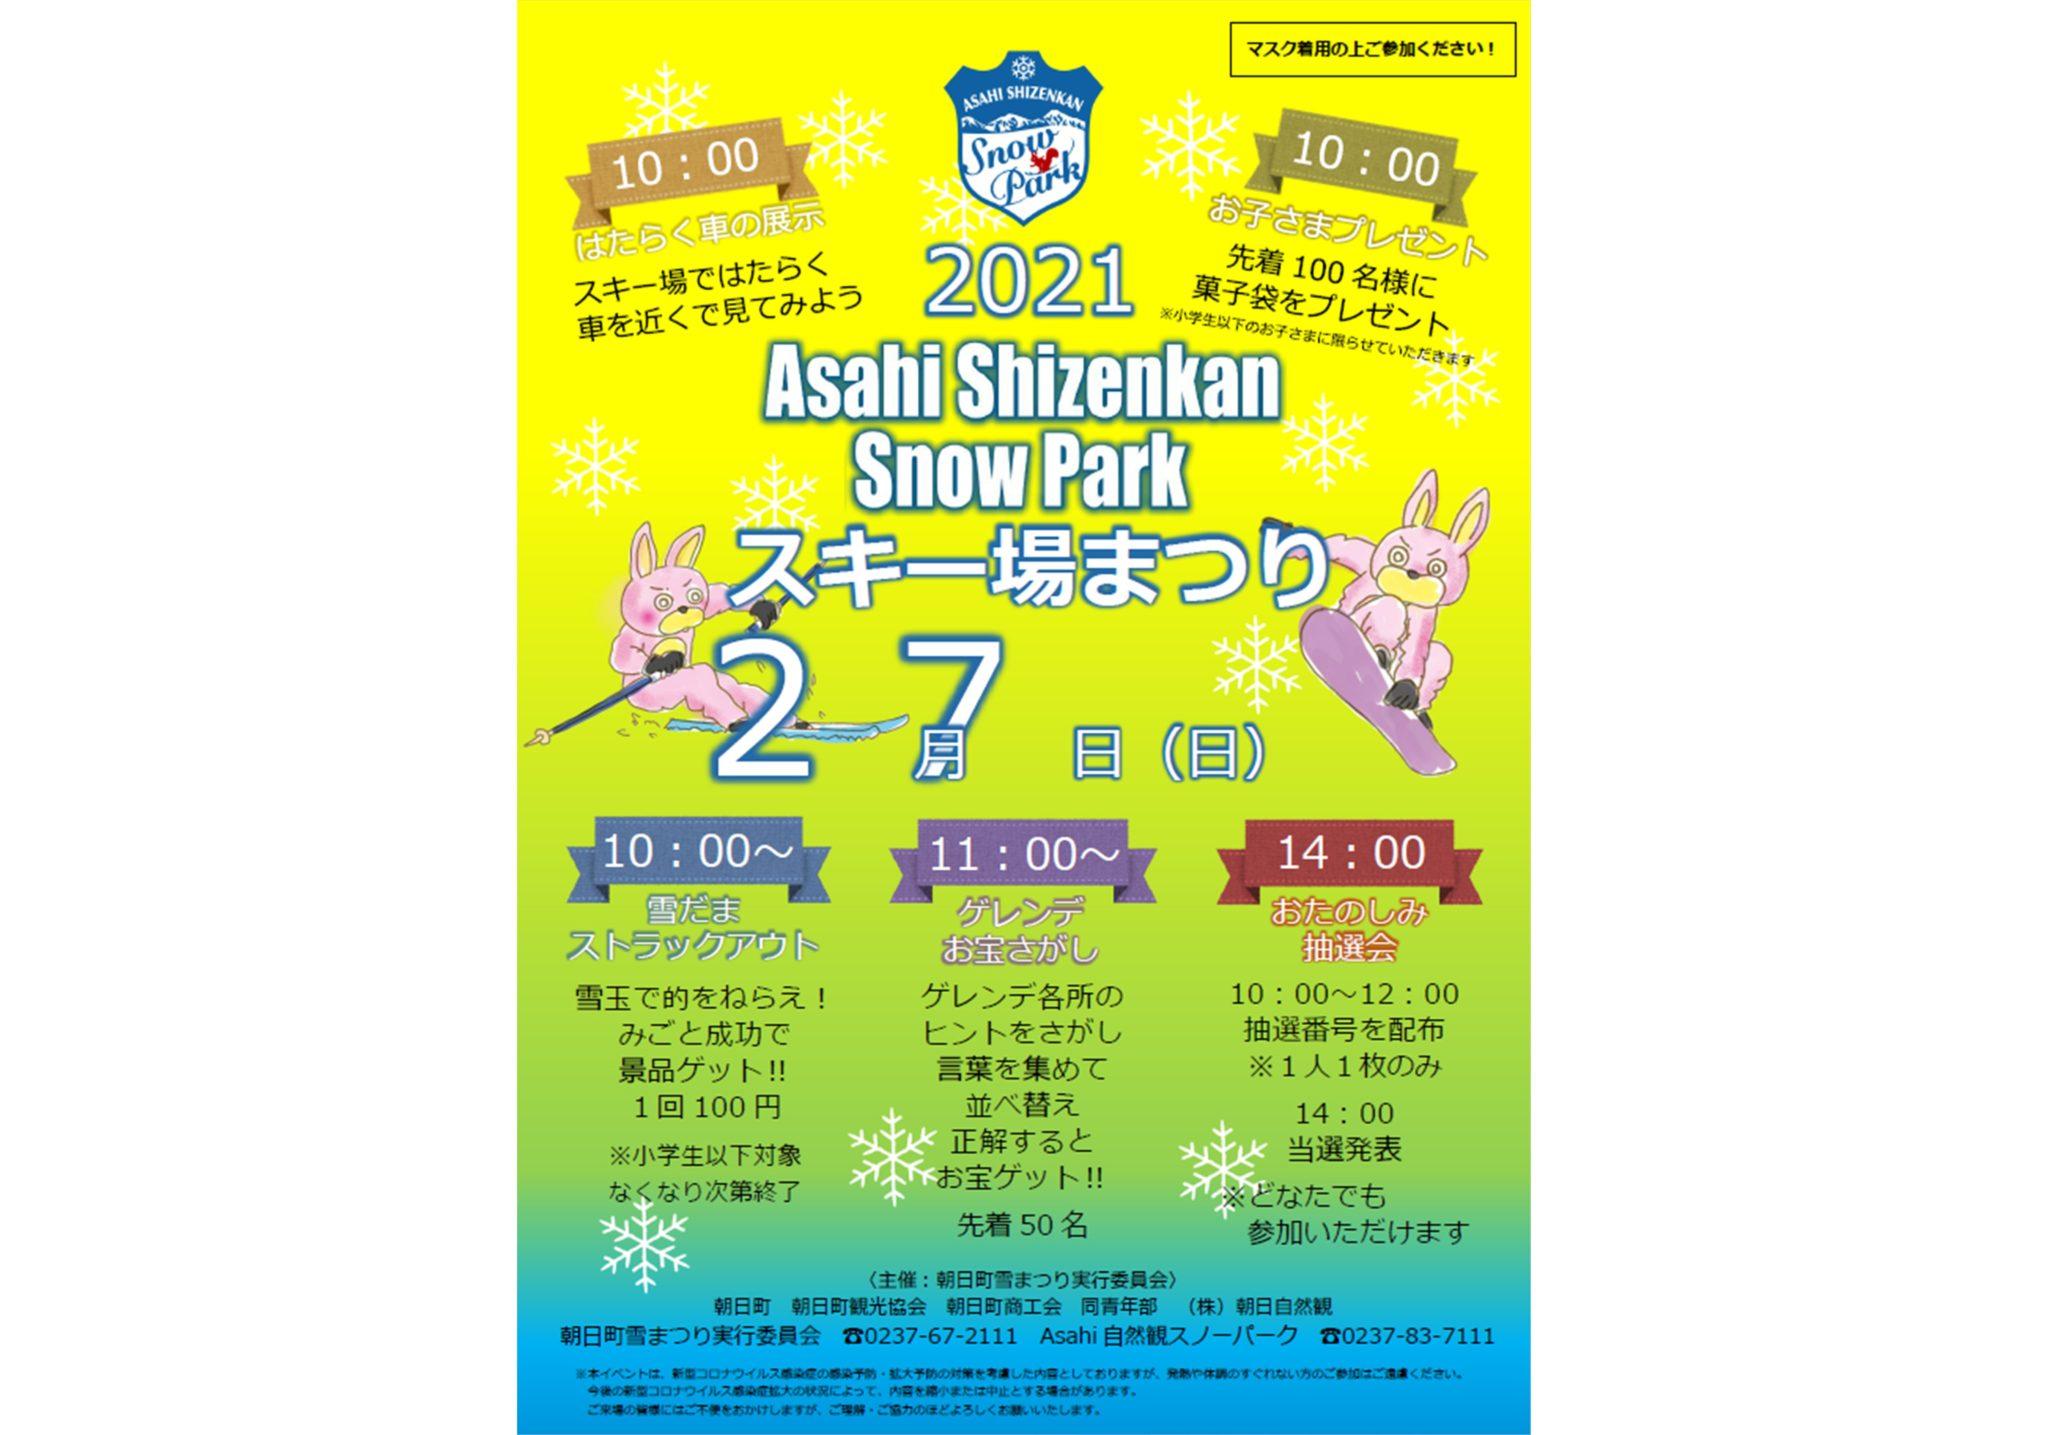 2021 Asahi Shizenkan Snow Park スキー場まつり